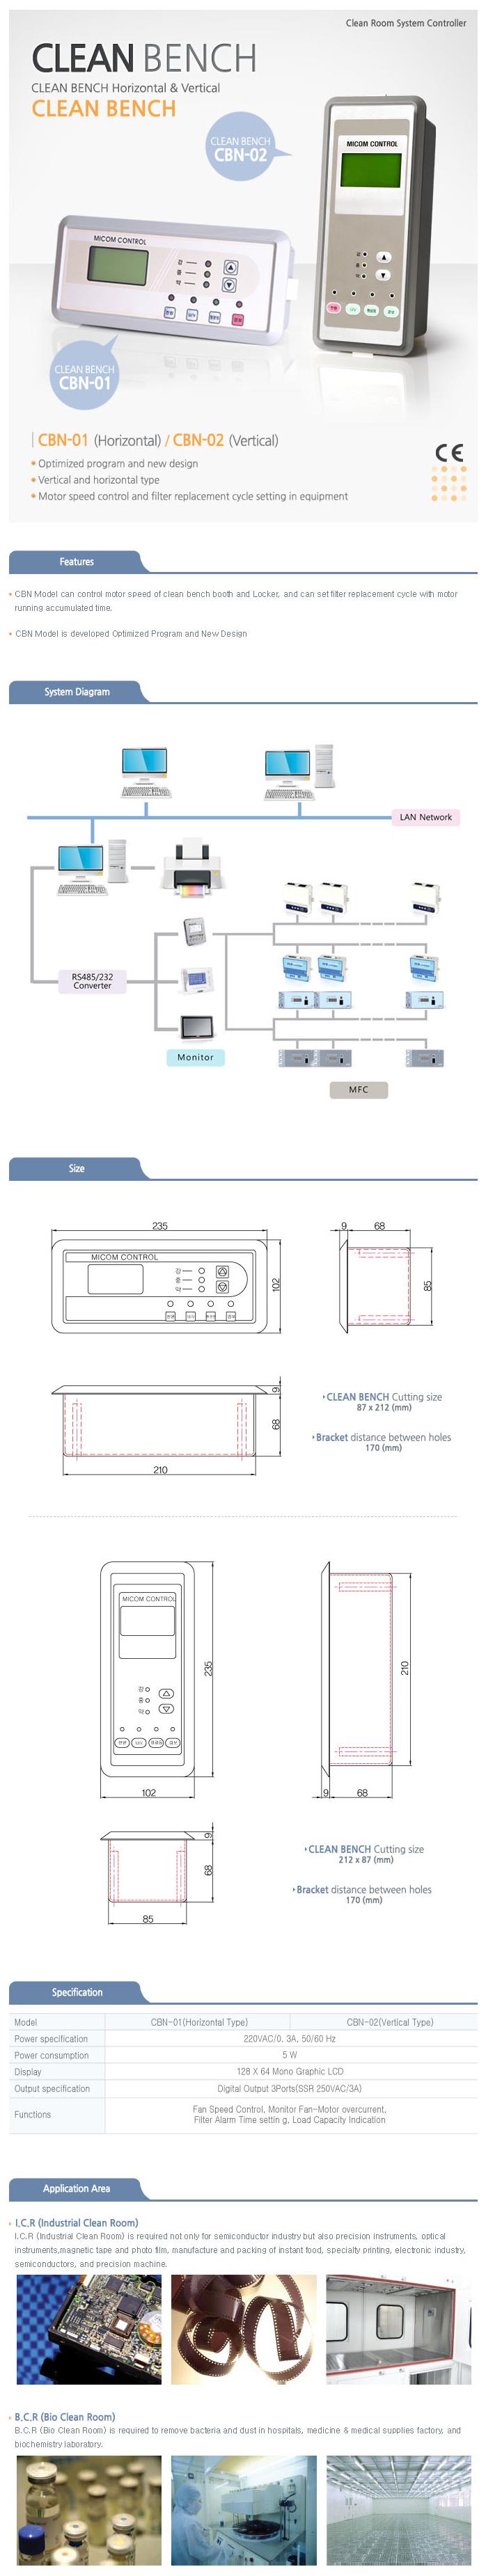 MST Clean Bench CBN-01 (Horizontal Type) / CBN-02 (Vertical Type)